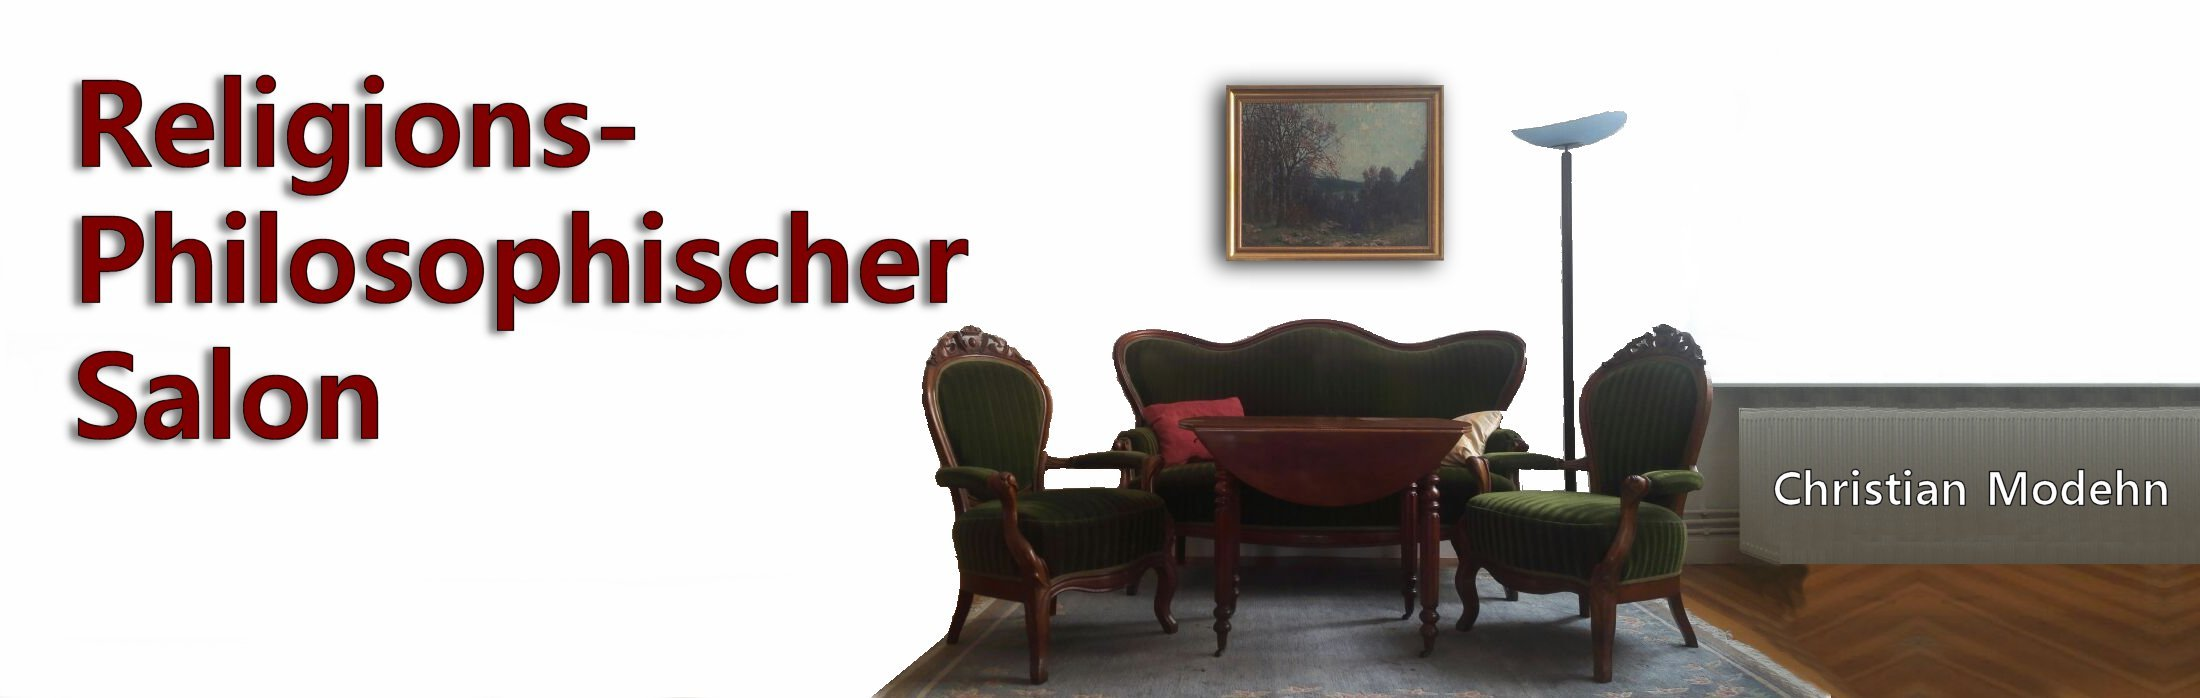 Religionsphilosophischer Salon